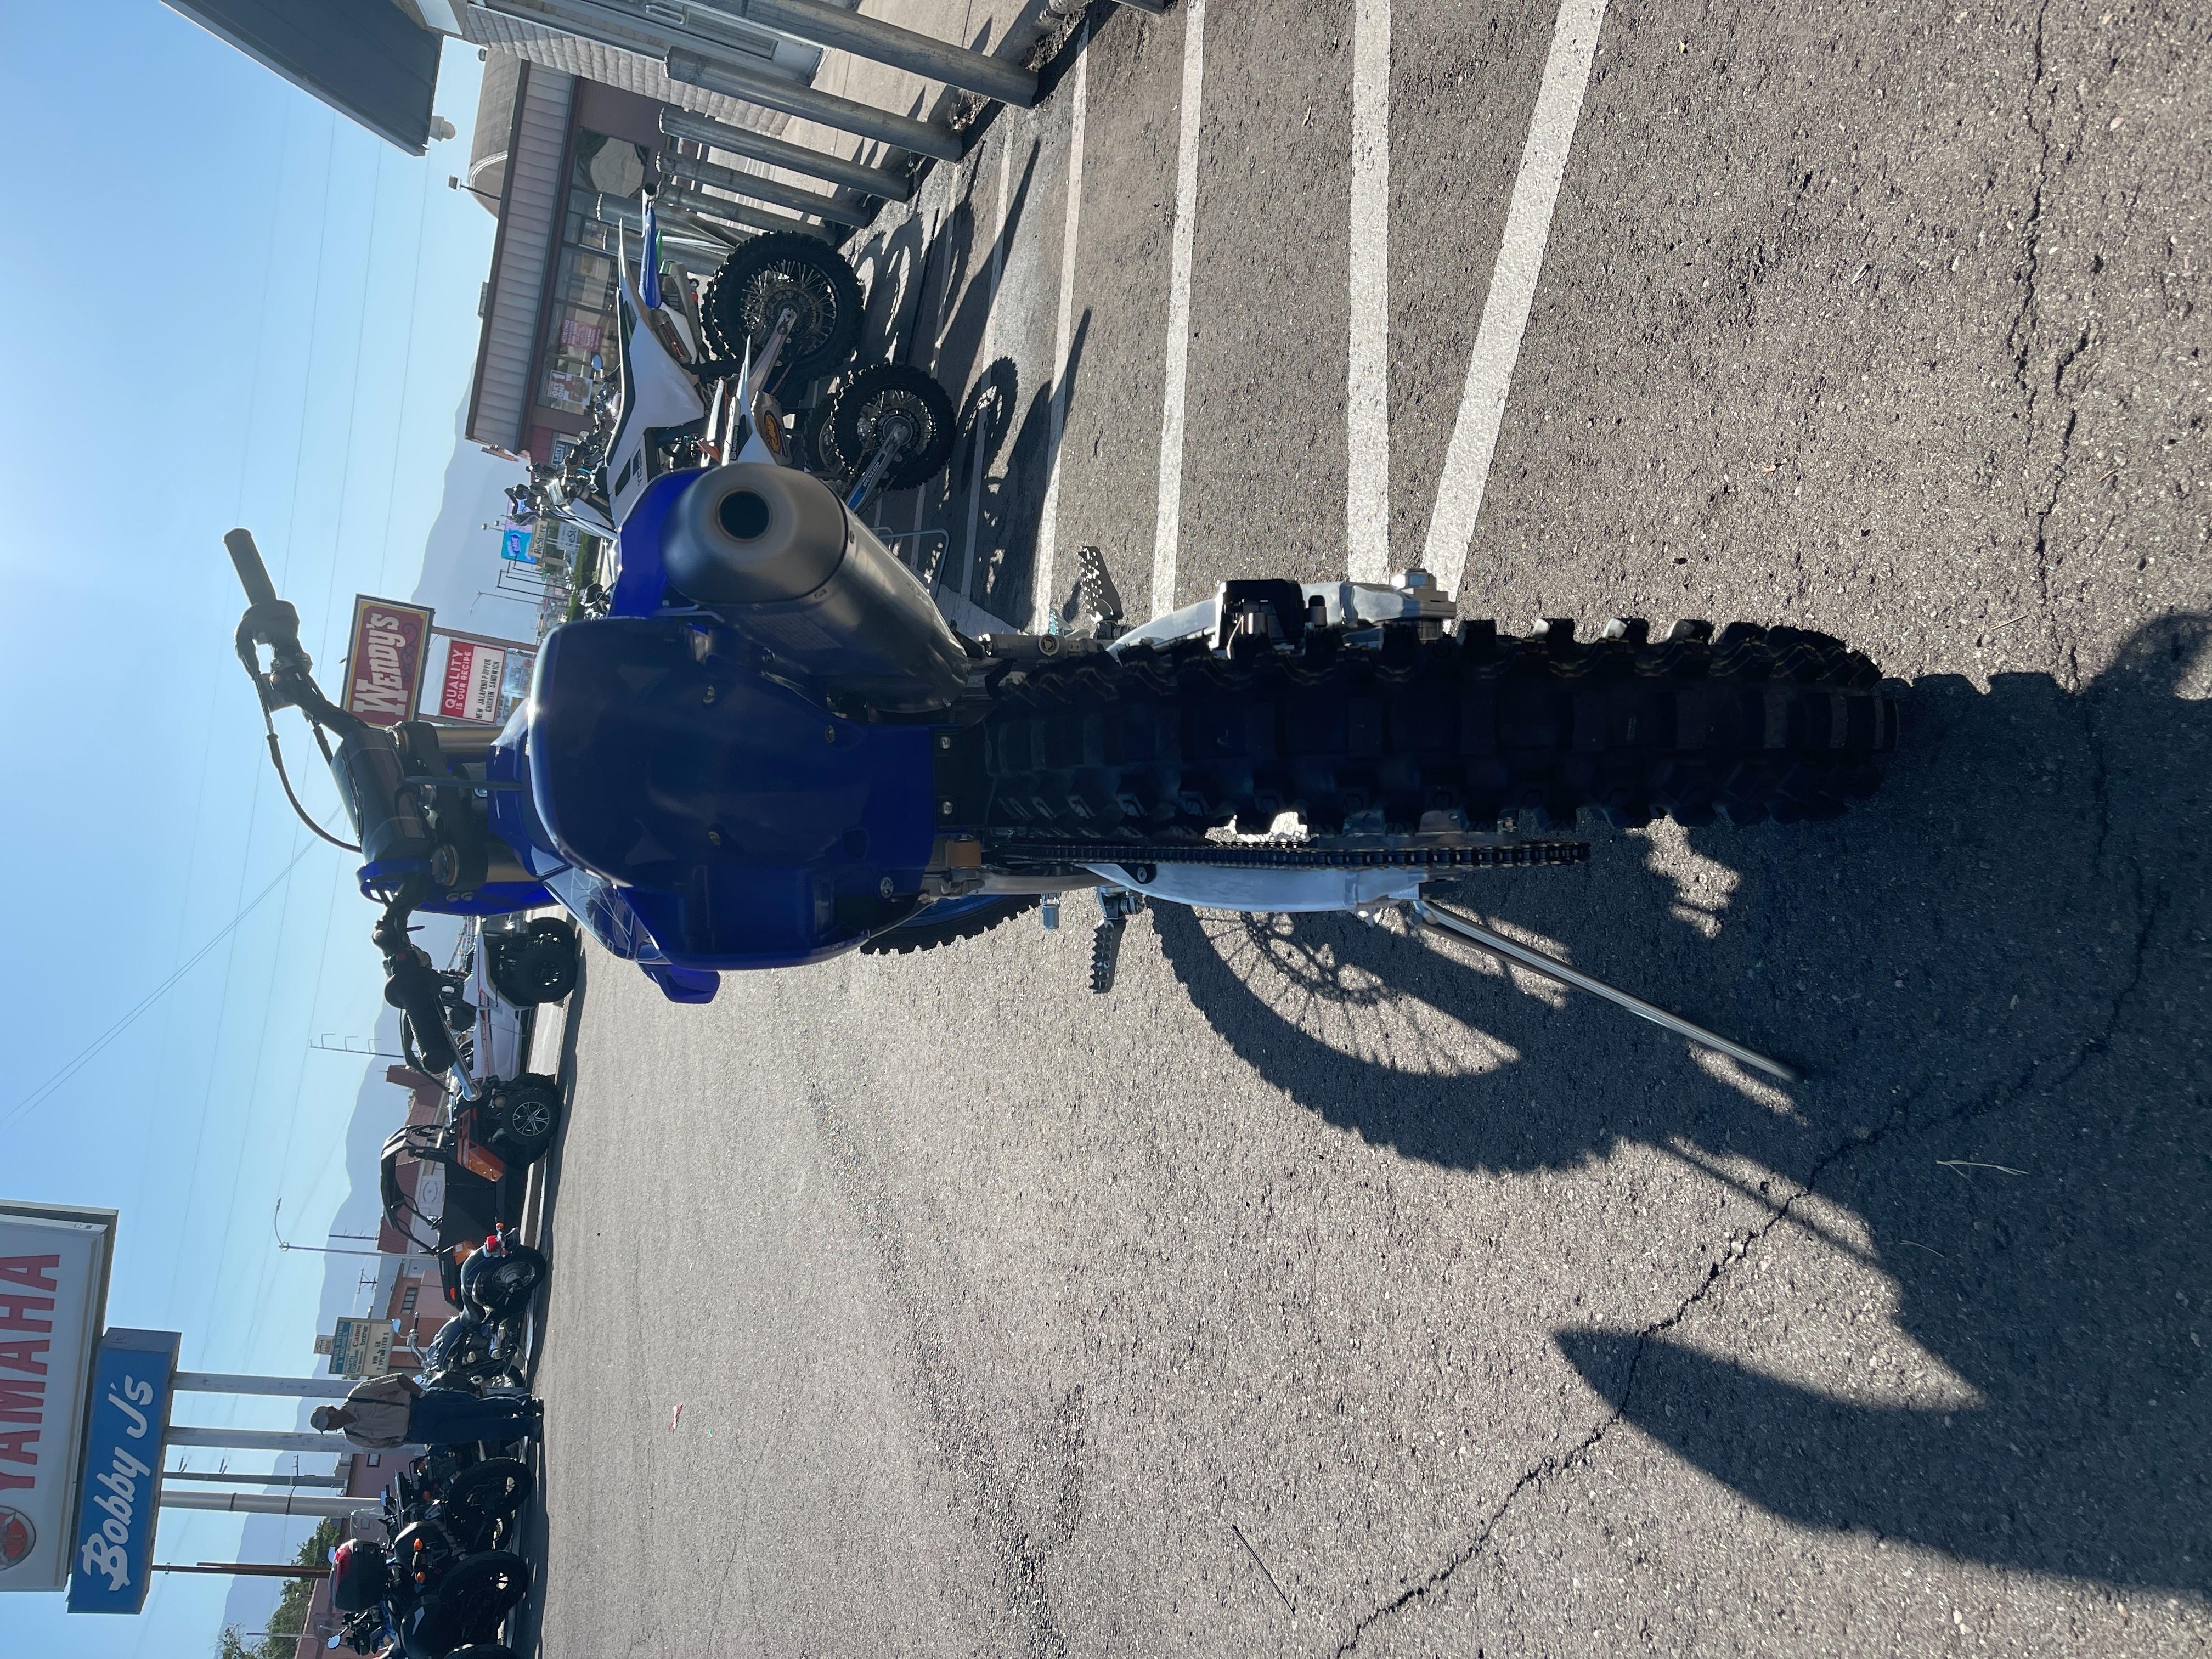 2022 Yamaha YZ-450F 450F at Bobby J's Yamaha, Albuquerque, NM 87110